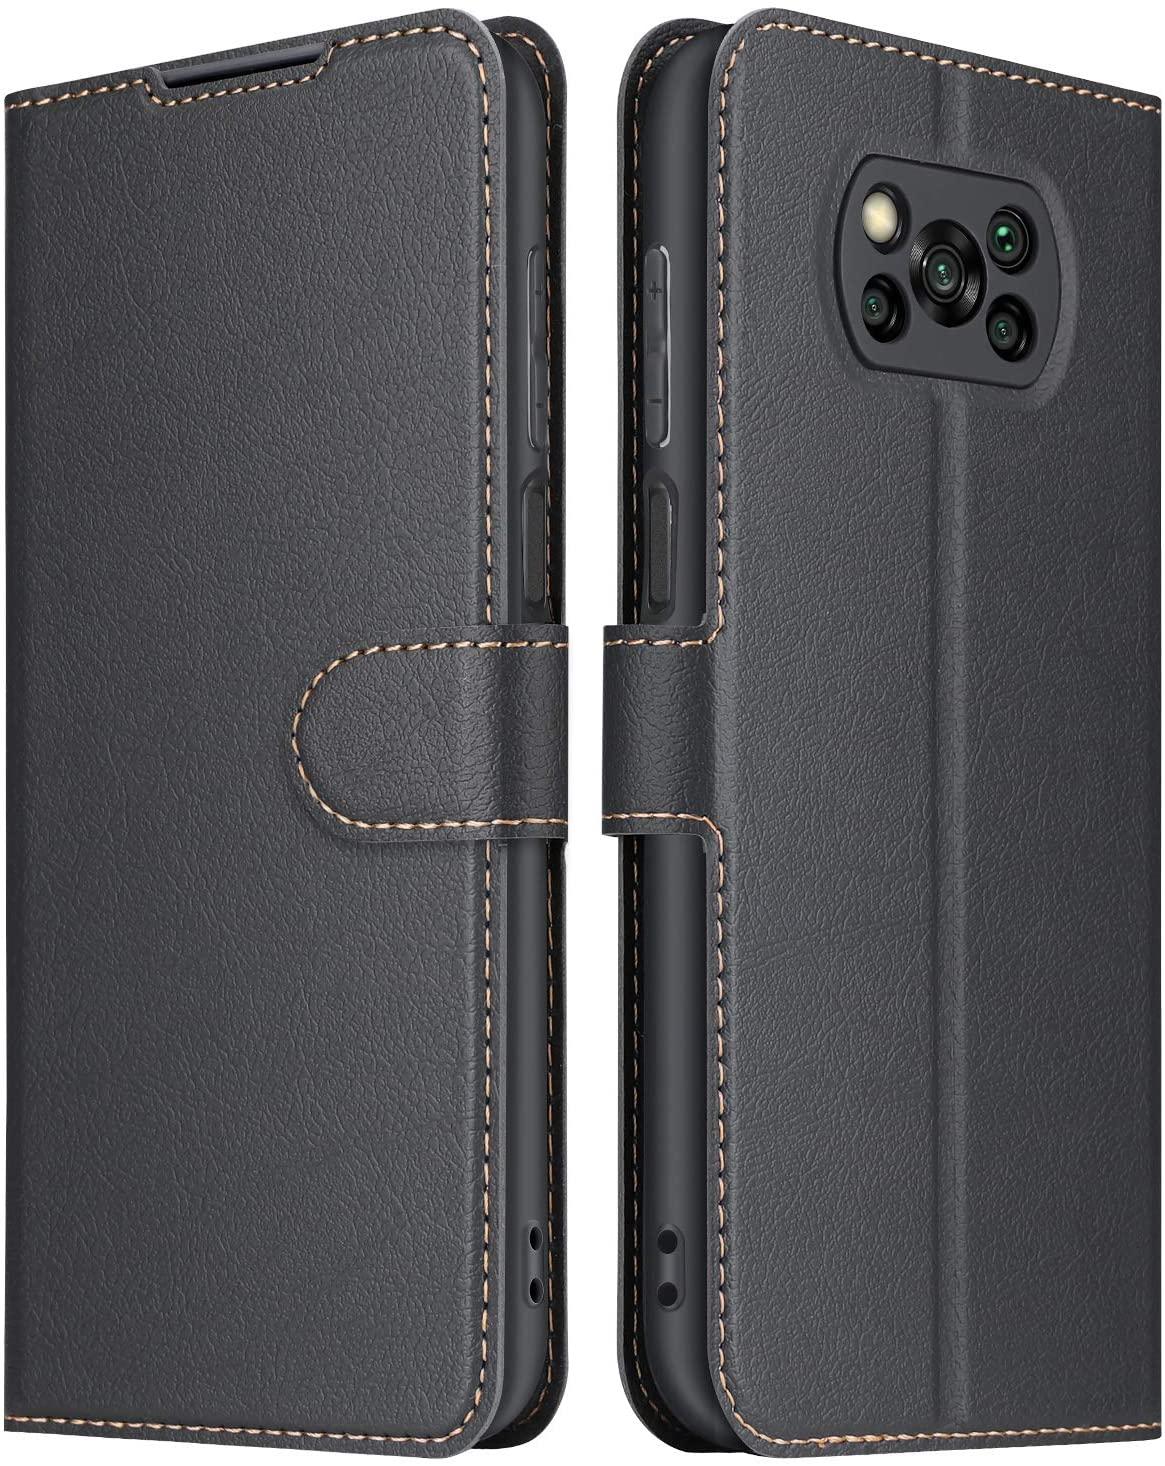 ELESNOW Funda Xiaomi Poco X3 NFC/Poco X3 Pro, Cuero Premium Flip Folio Carcasa Case para Xiaomi Poco X3 NFC (Negro)